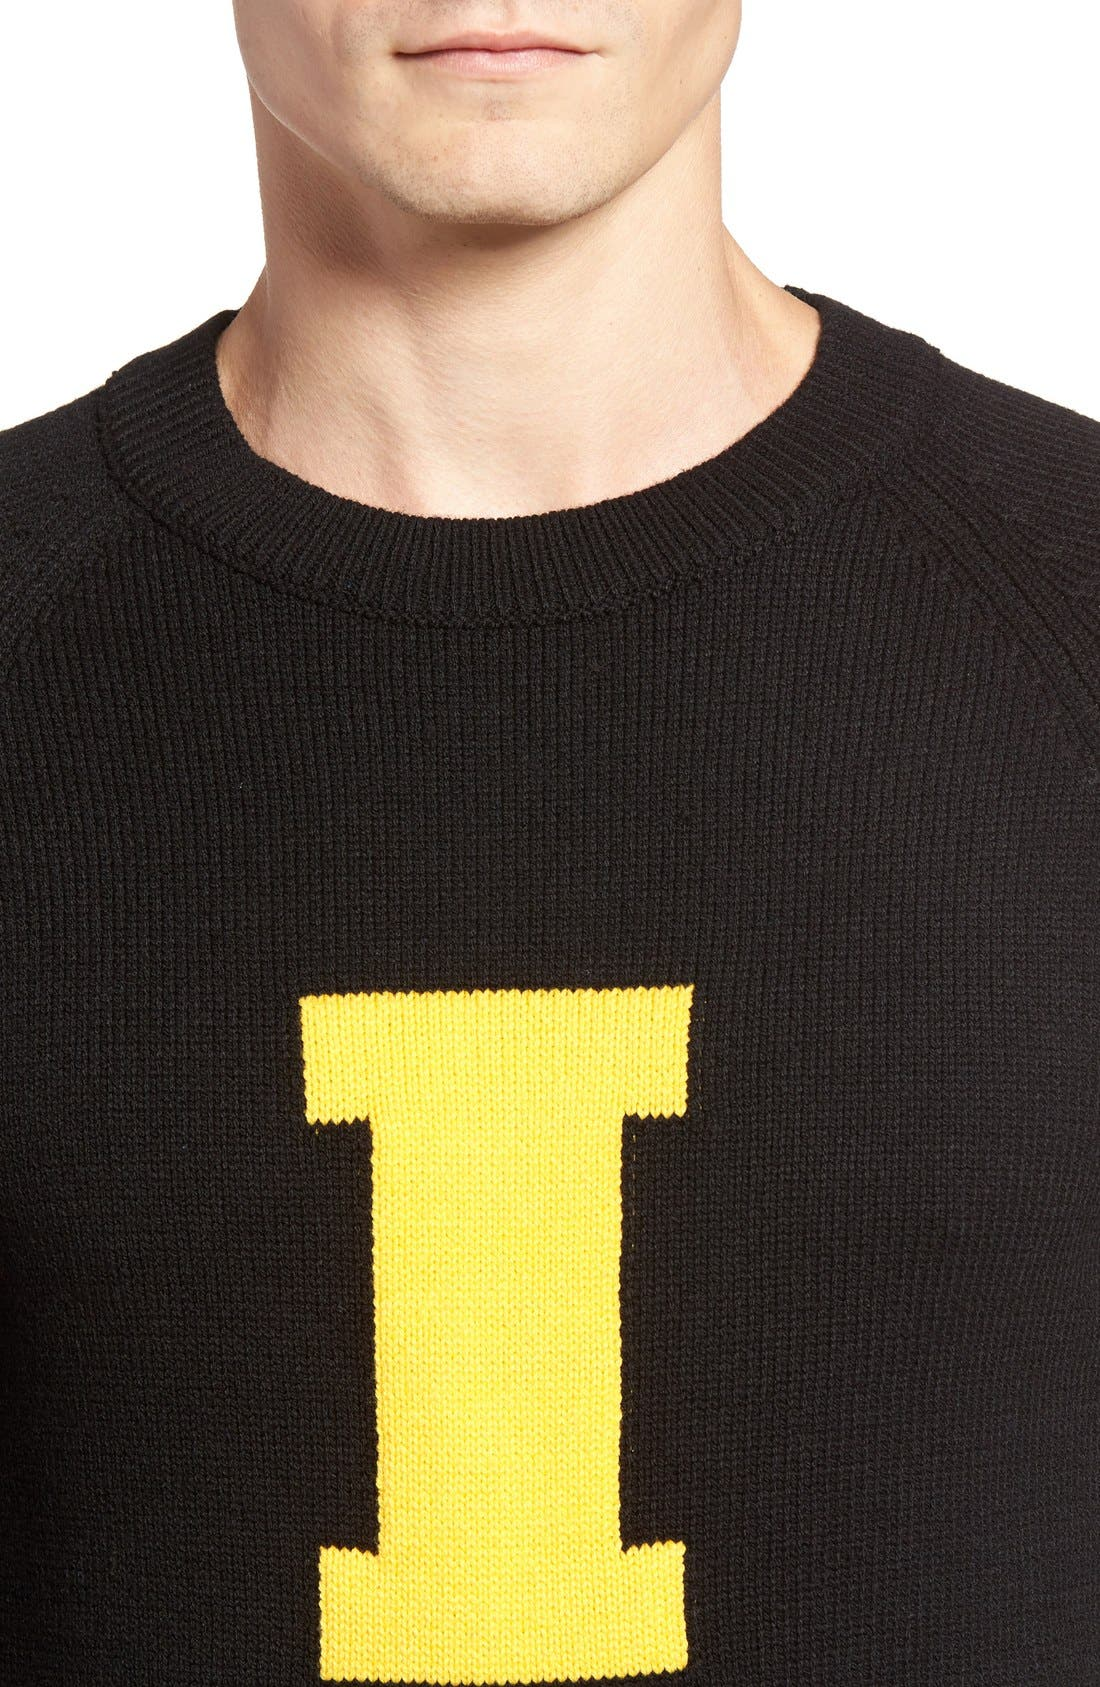 HILLFLINT,                             Iowa Heritage Sweater,                             Alternate thumbnail 4, color,                             001